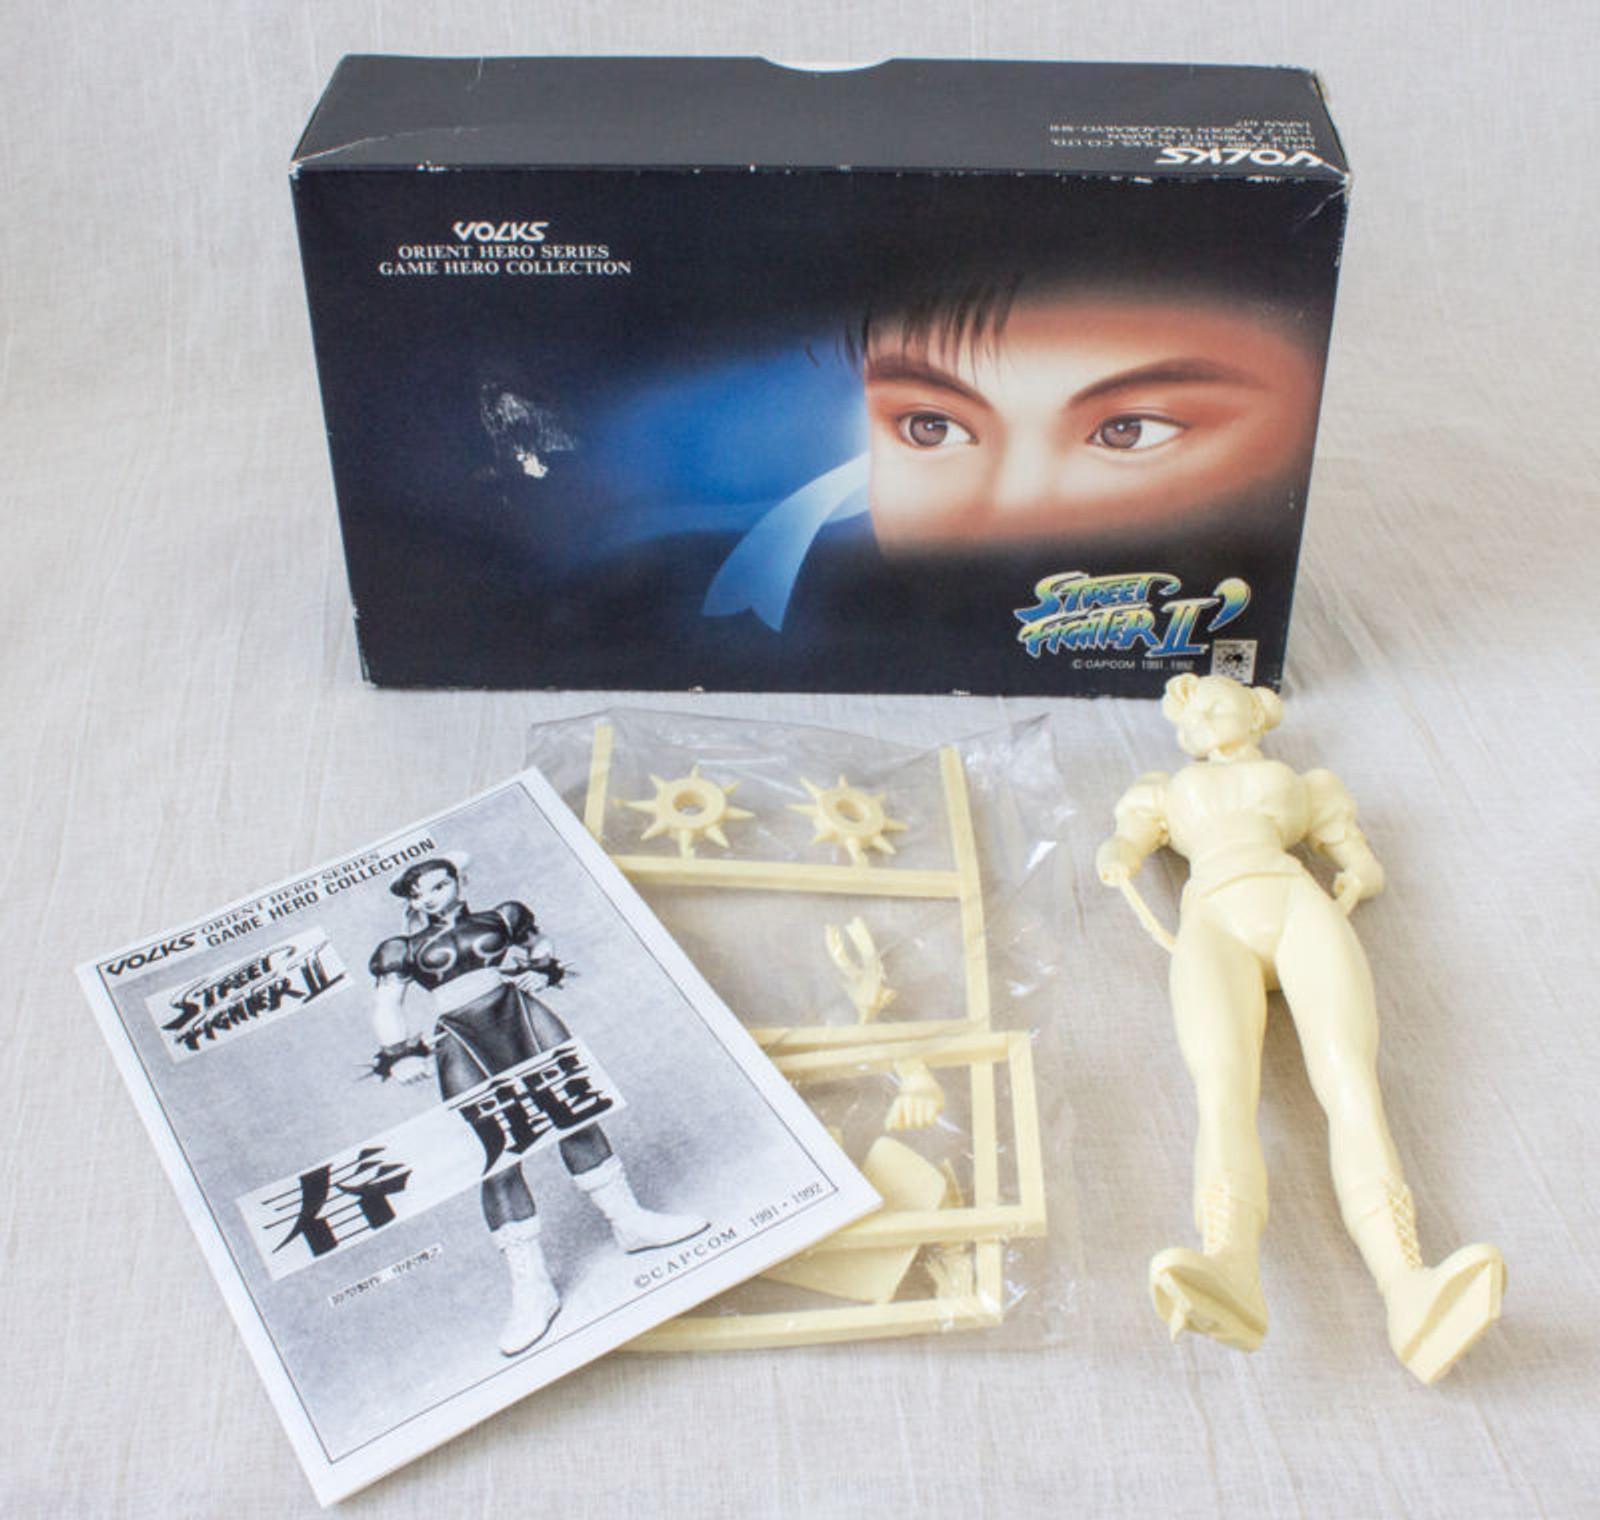 street fighter 2 chun li 1 8 model kit garage kit figure volks capcom japan game